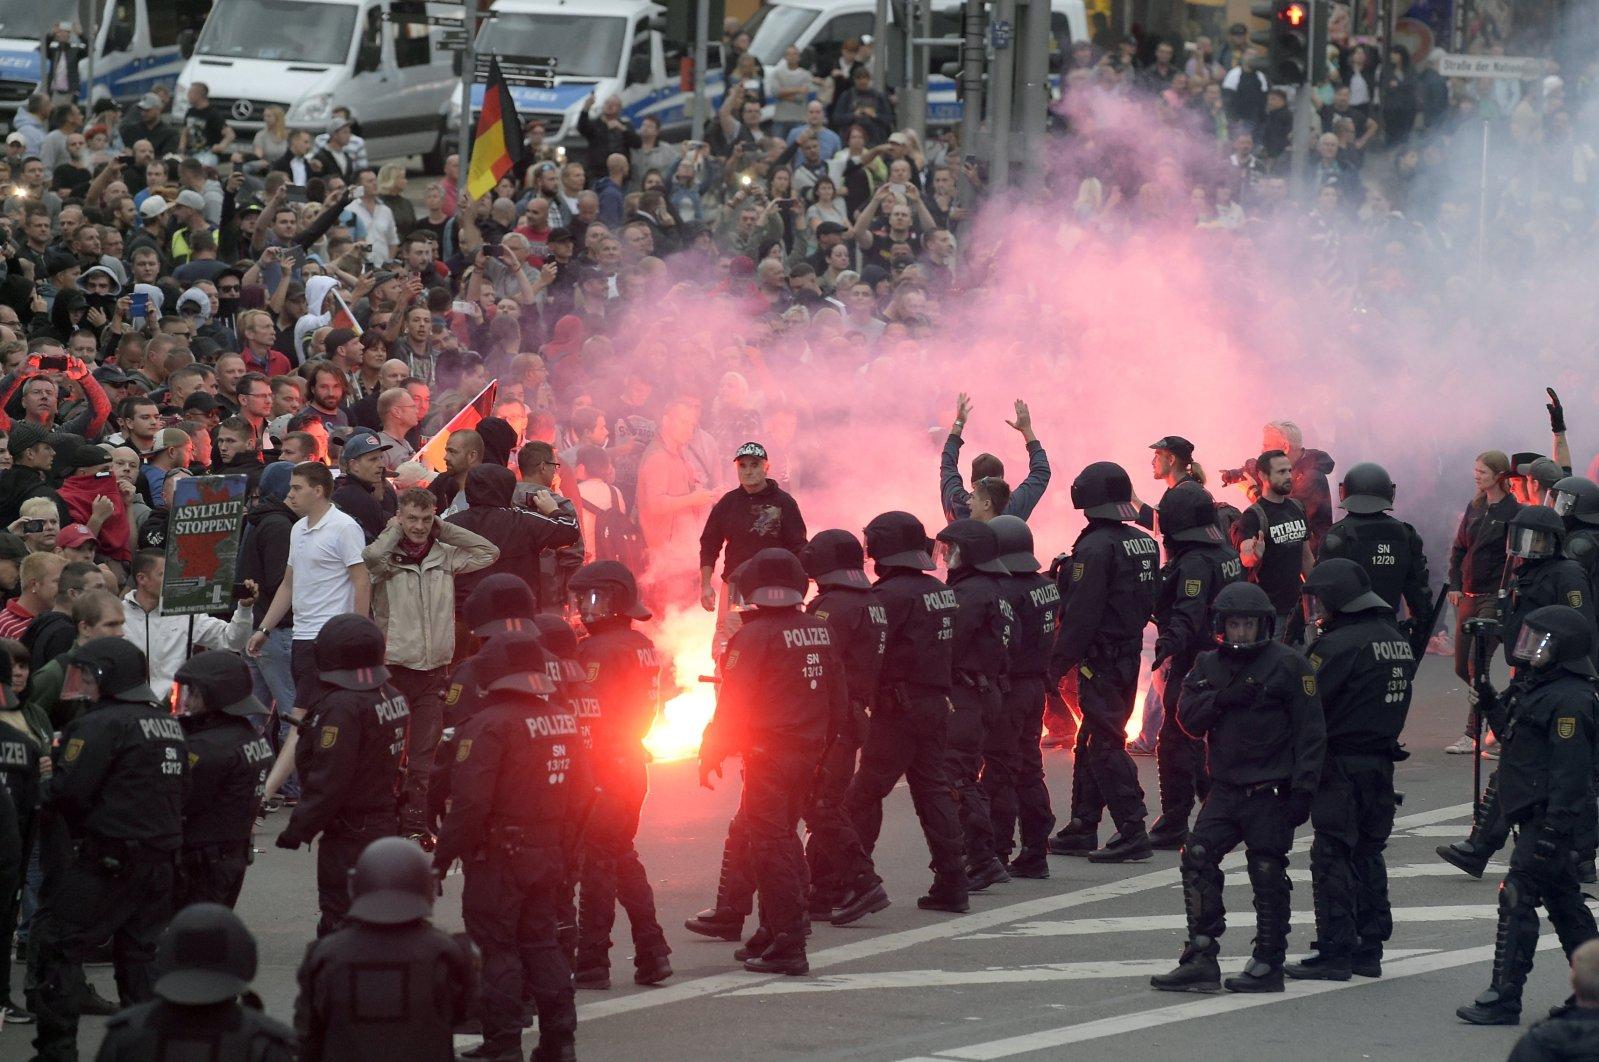 Far-right demonstrators light fireworks in Chemnitz, Germany, Aug 27, 2018. (AP Photo)